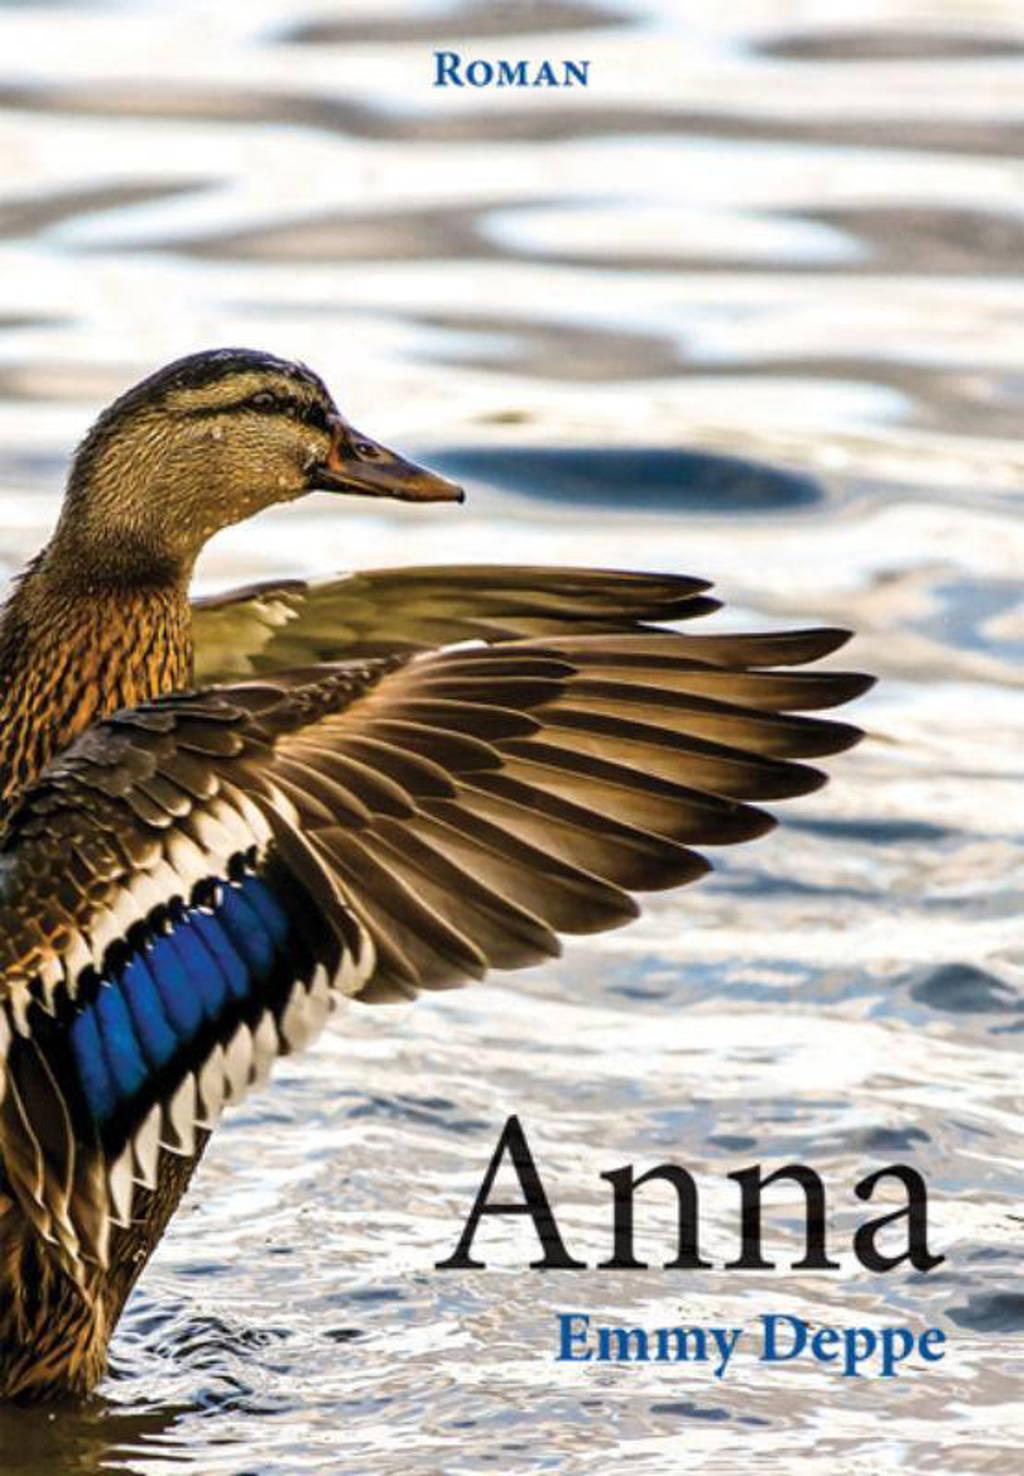 Anna - Emmy Deppe